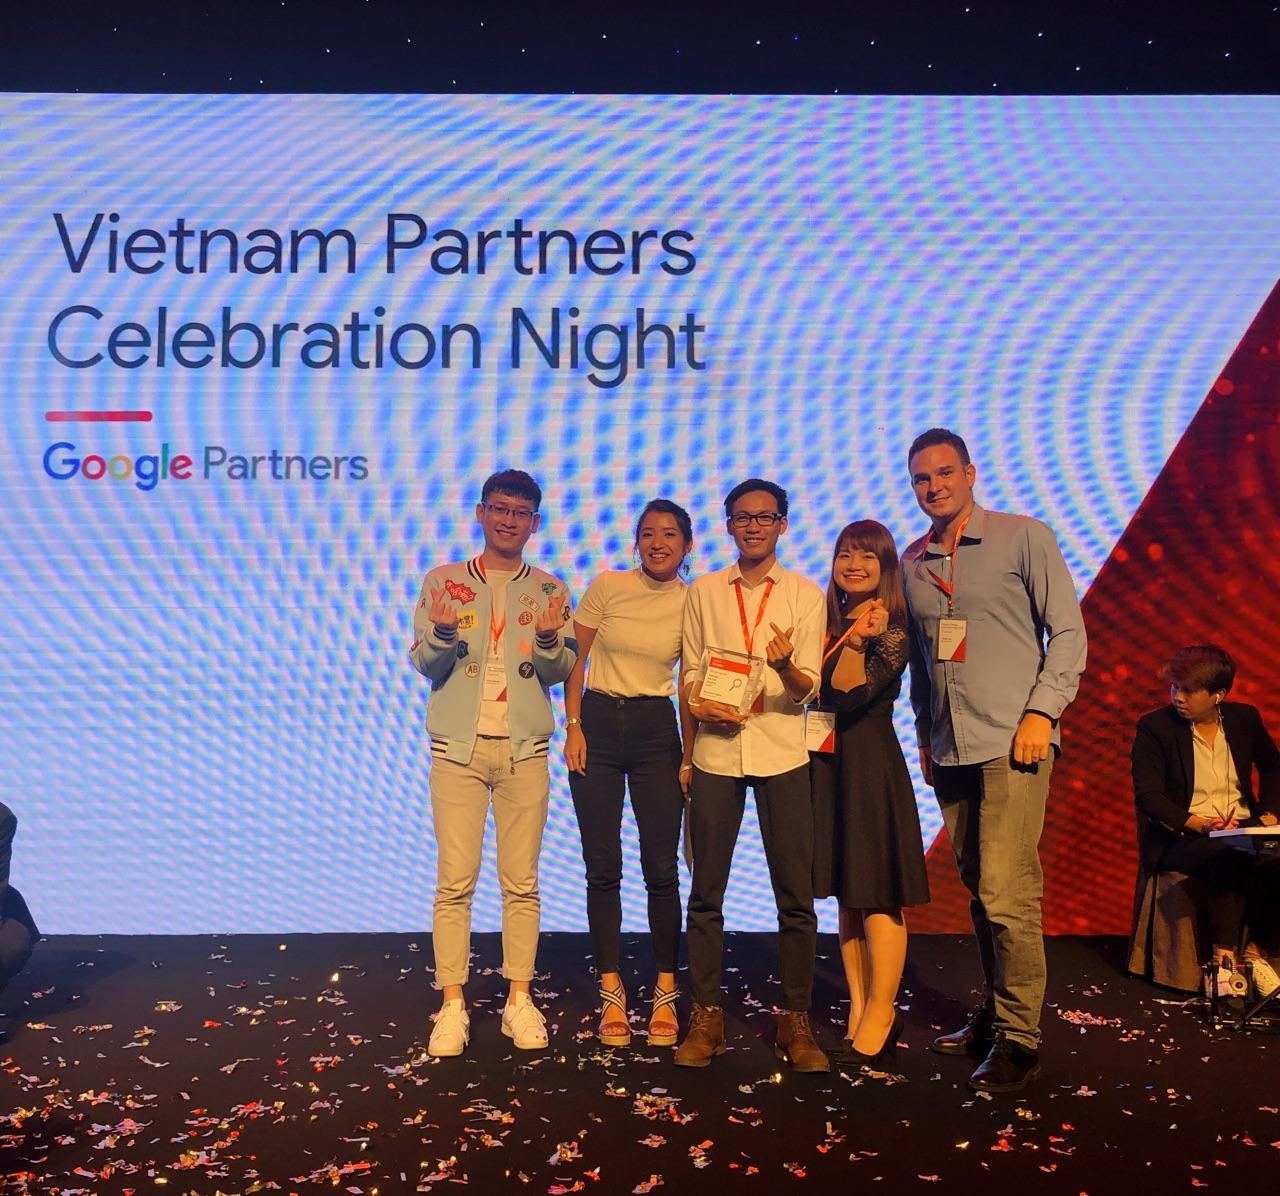 Bluesummit team on stage at Google Premier Partner's Awards Event 2018.